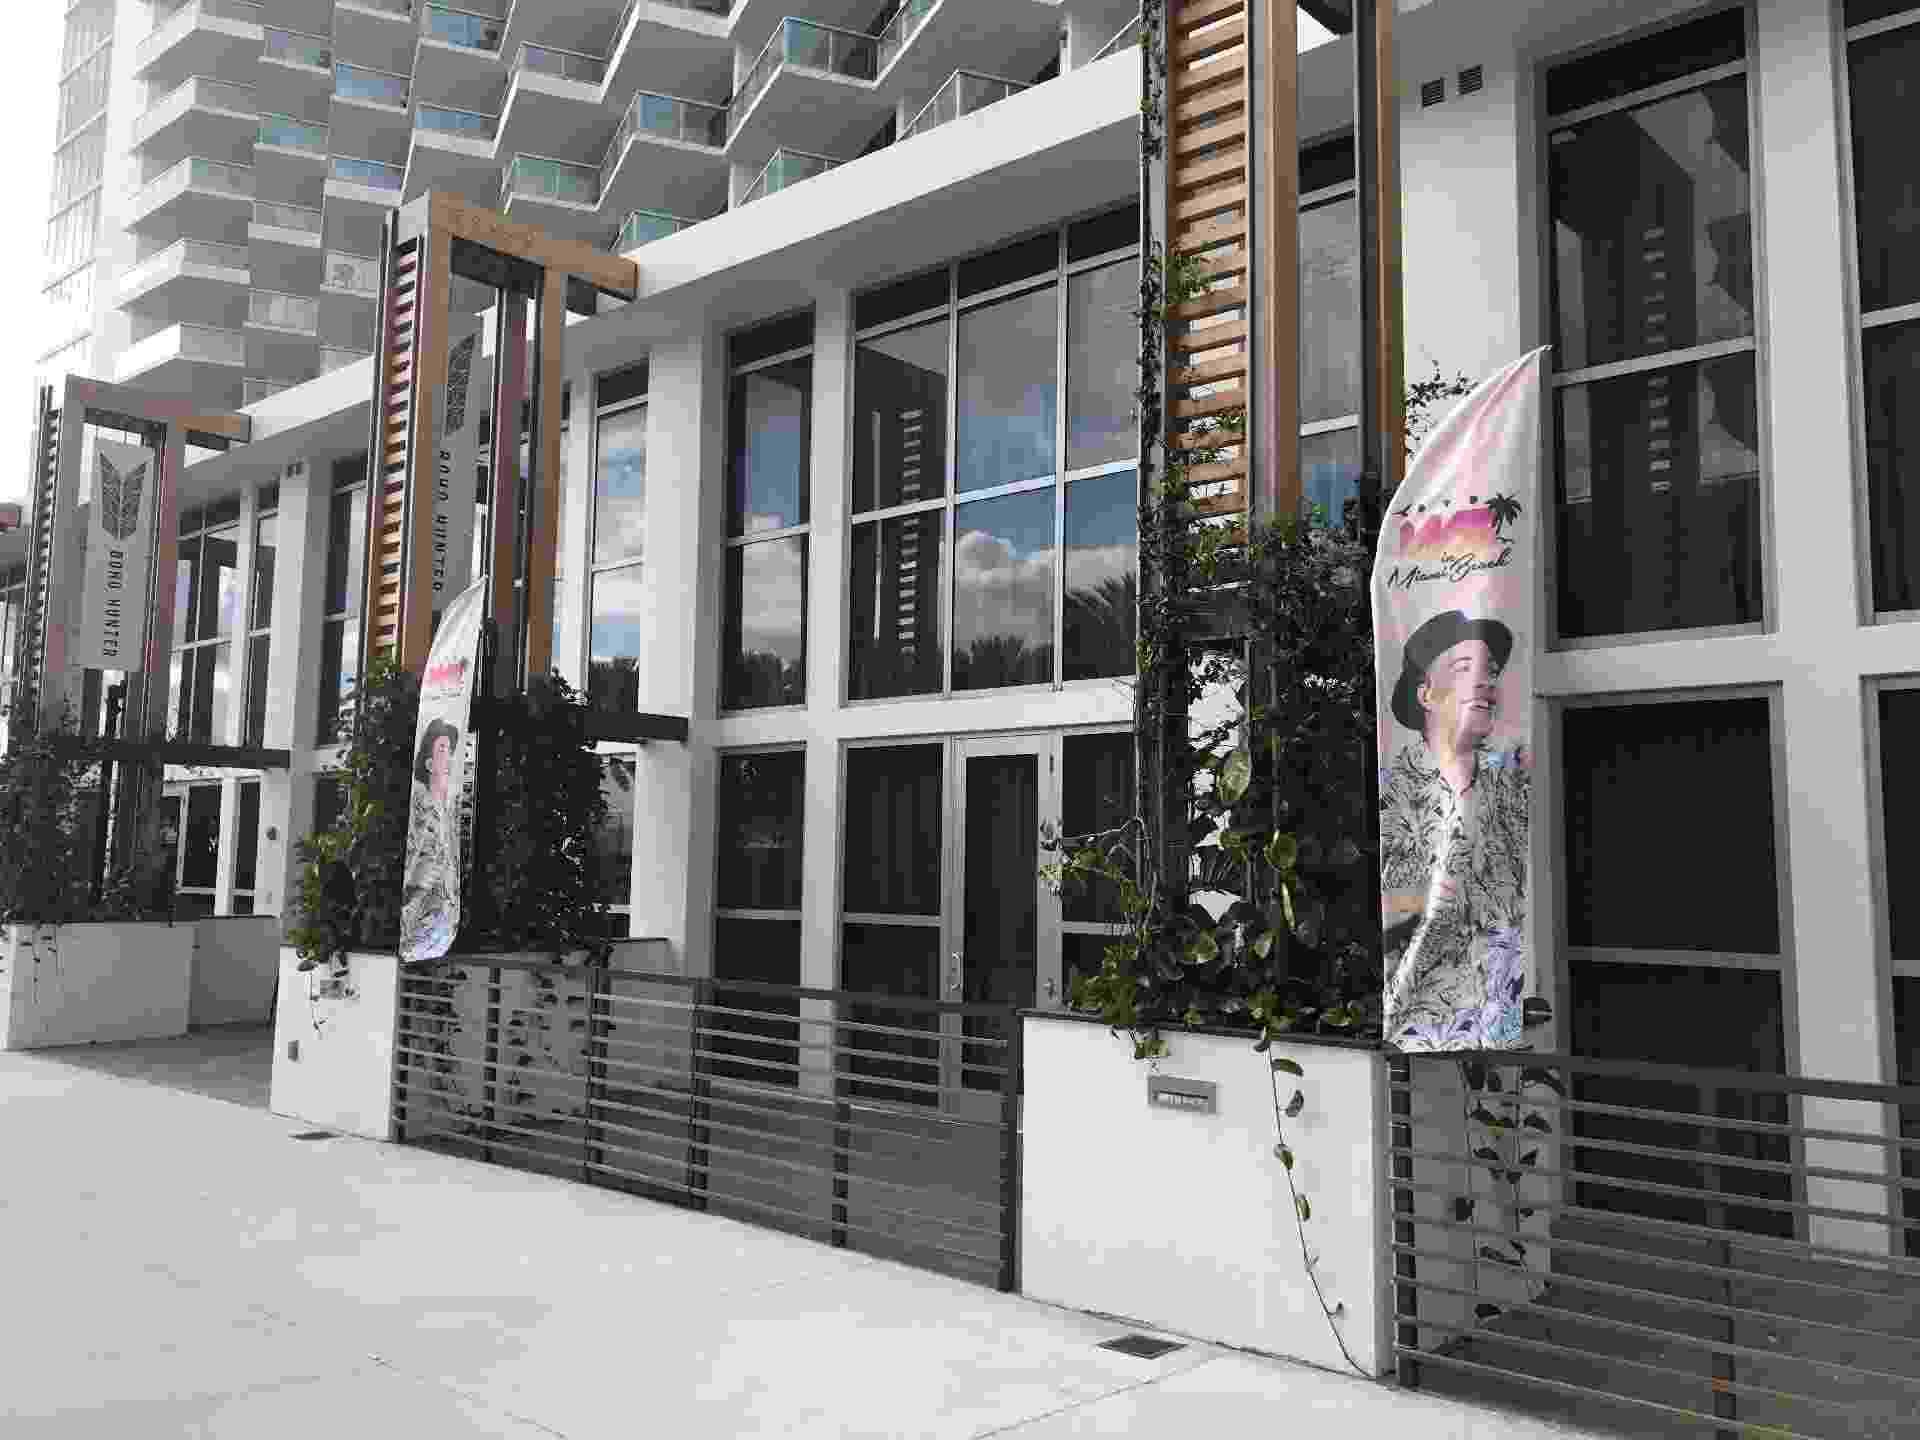 Fachada do Eden Roc Resort, onde Wesley Safadão gravará seu primeiro DVD internacional - Ederson Lima